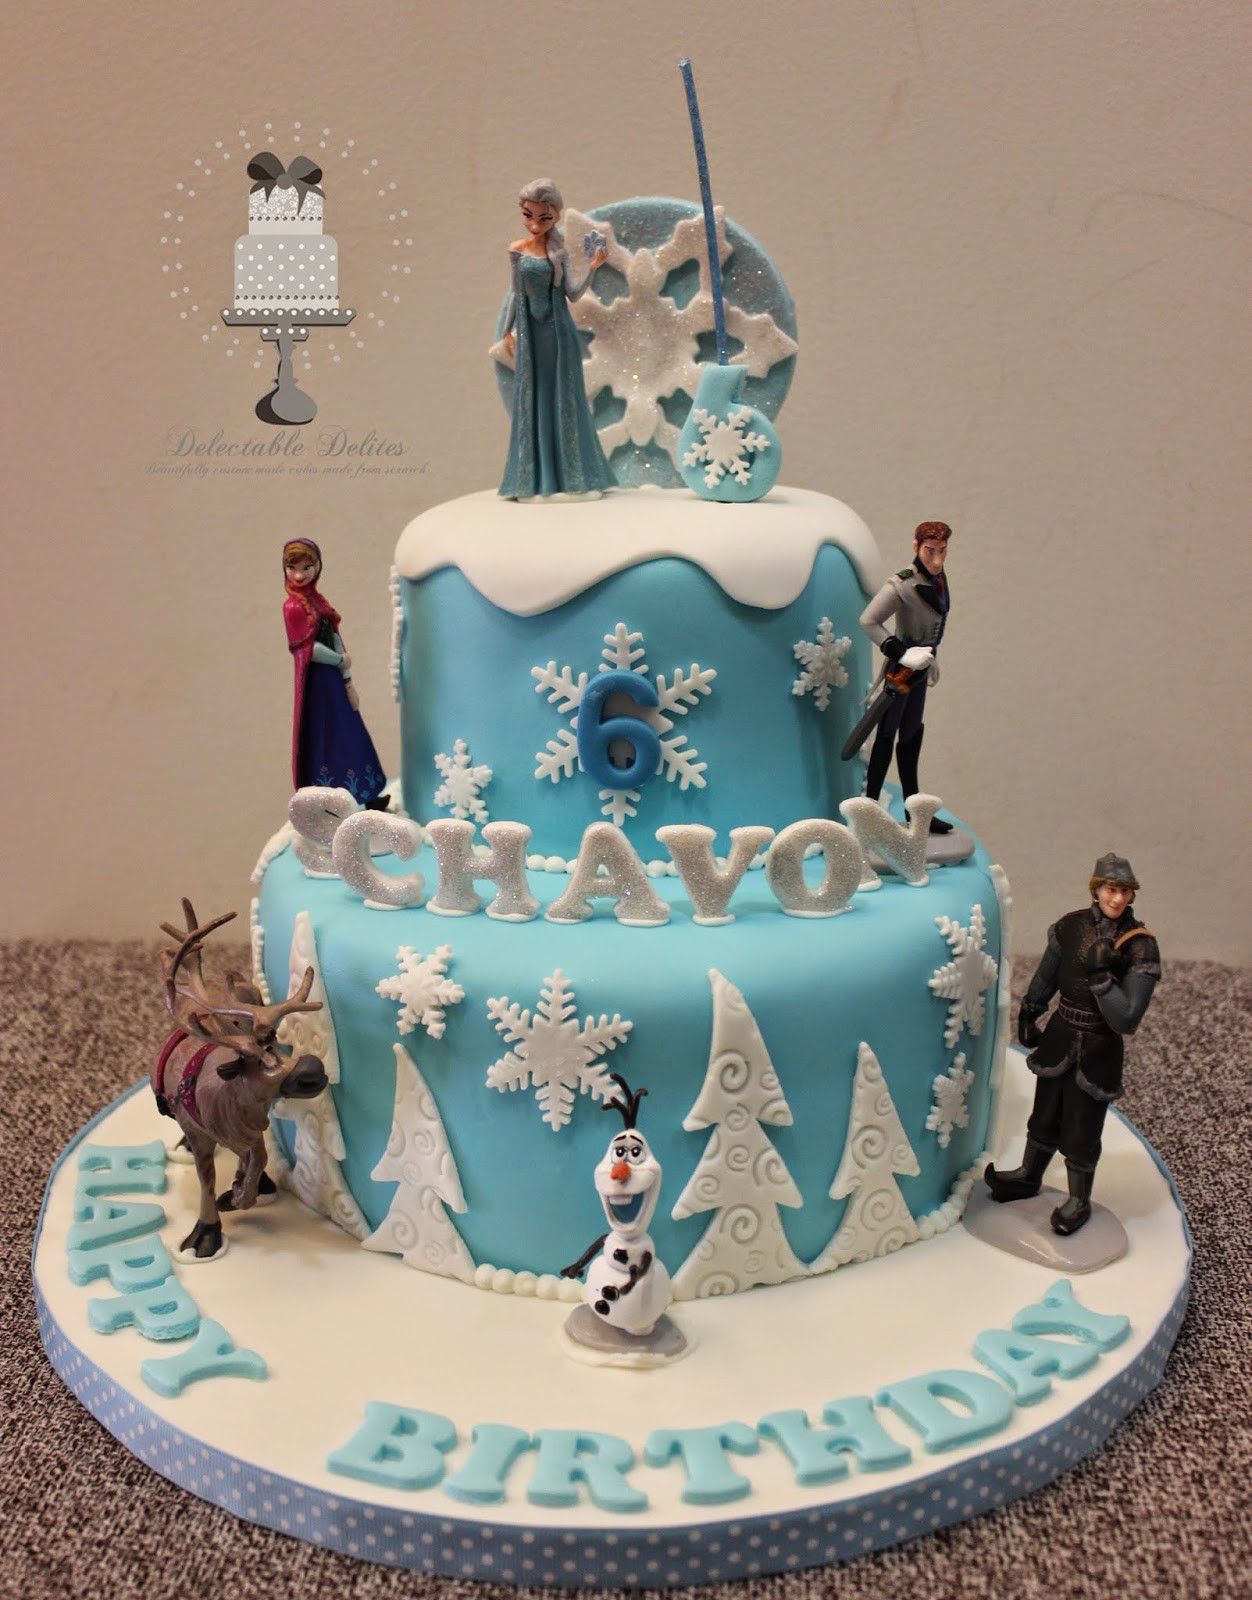 Best ideas about Frozen Birthday Cake Walmart . Save or Pin Delectable Delites Disney Frozen theme cake Now.